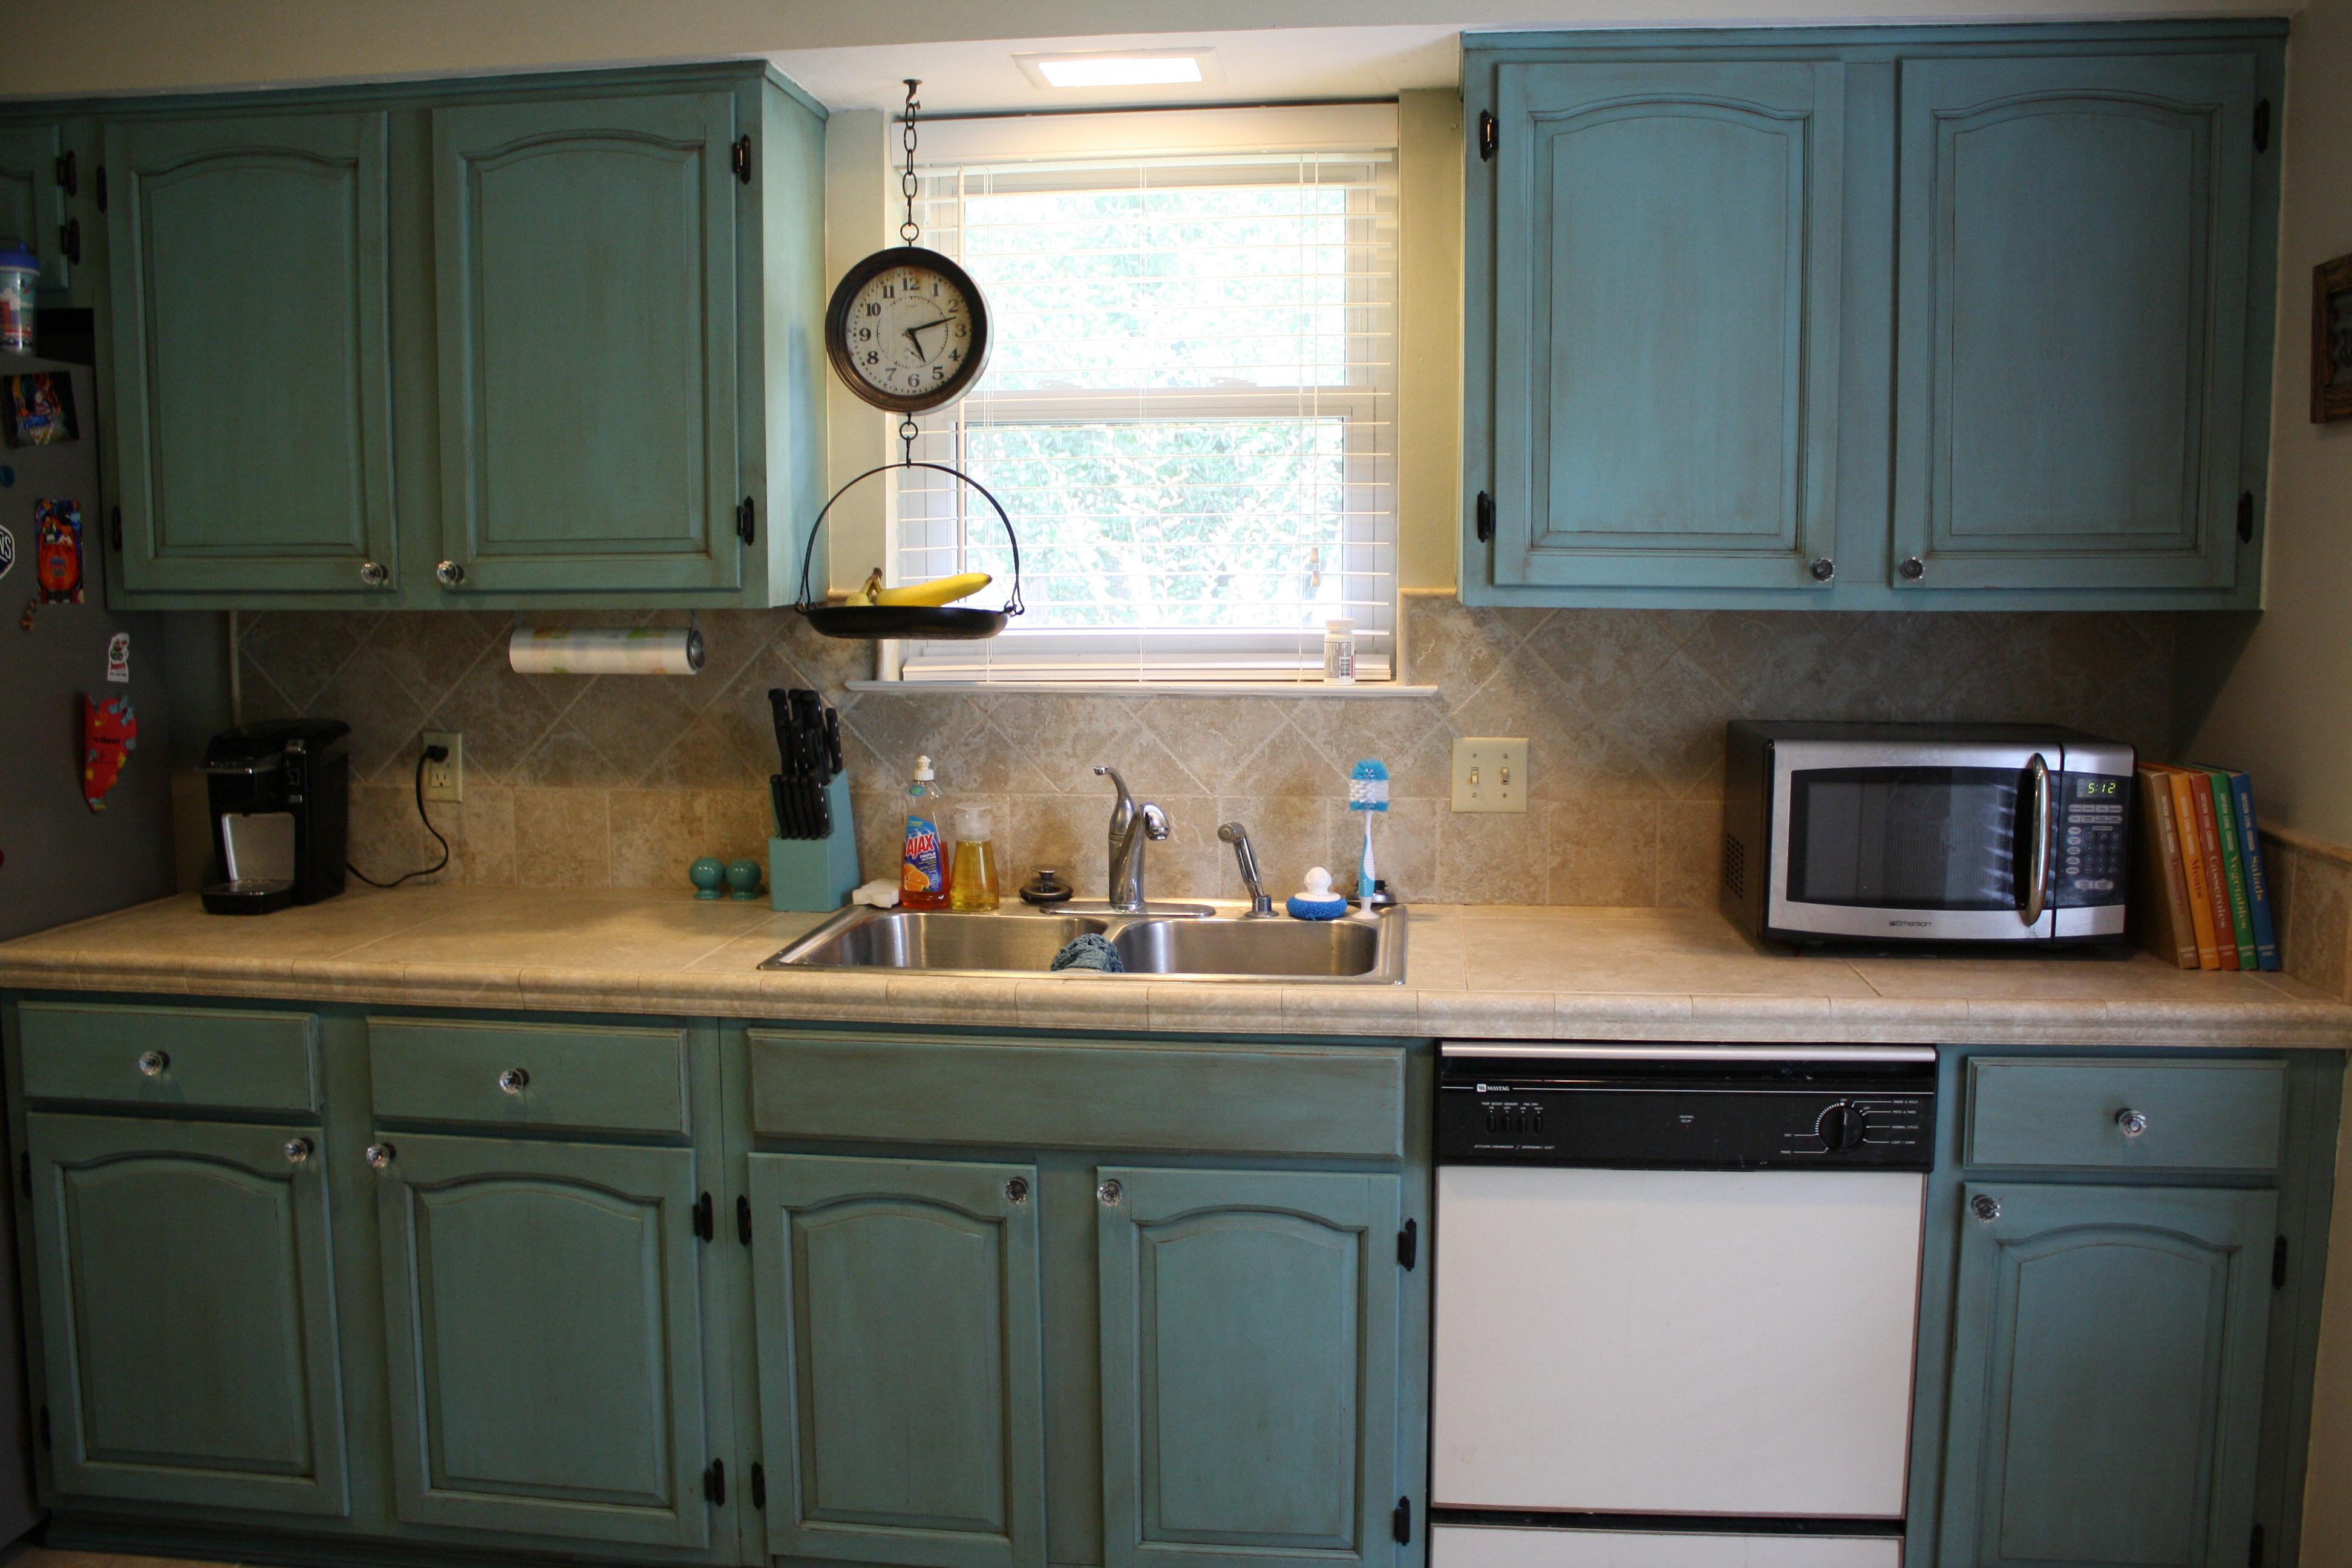 Painting Kitchen Cabinets With Annie Sloan Chalk Paint Northshore Parent